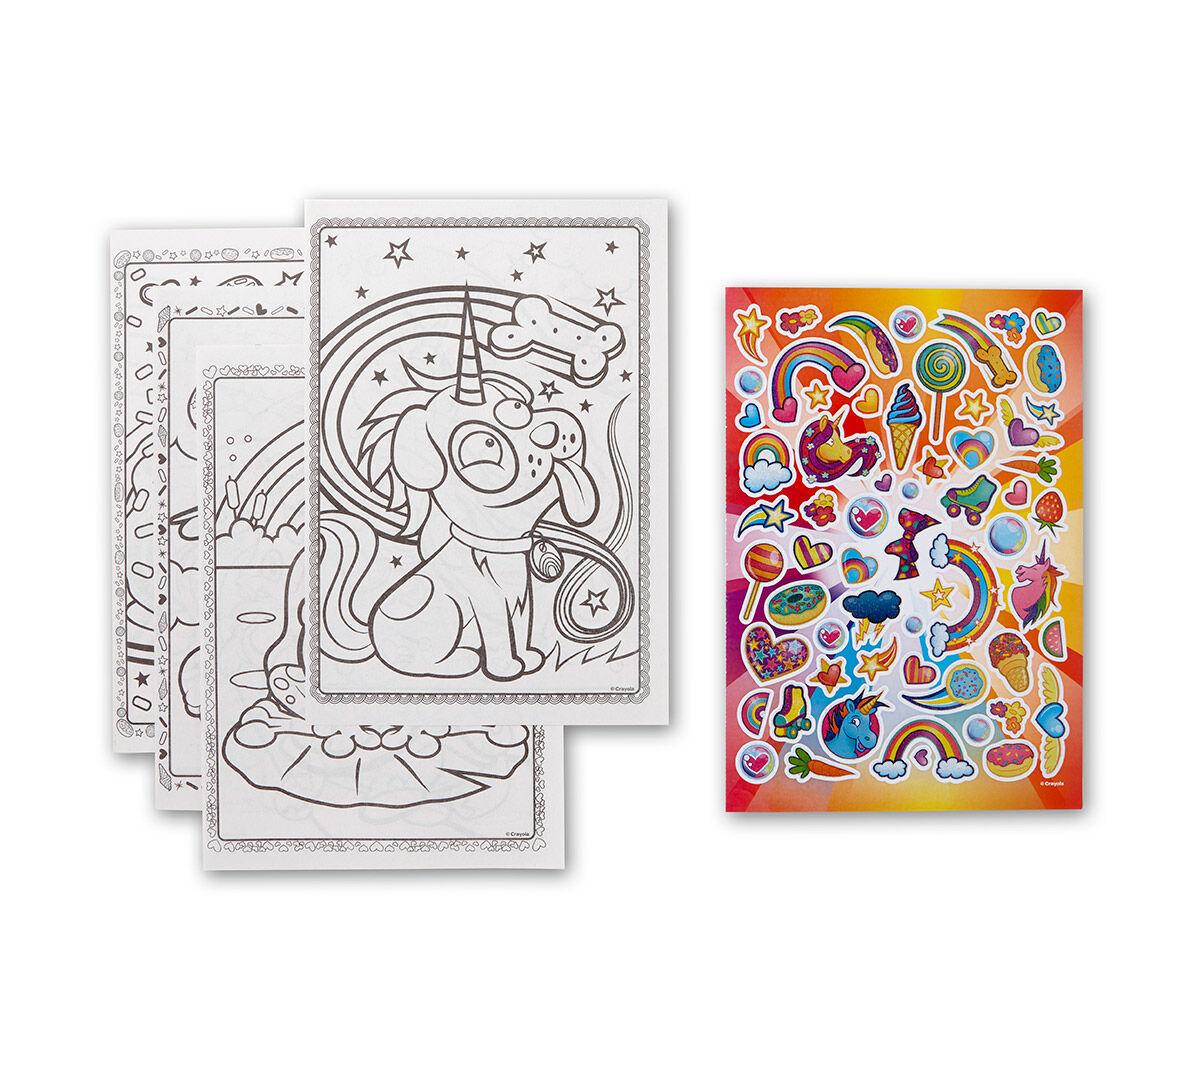 Uni-Creatures Coloring Book & Sticker Sheet | Crayola